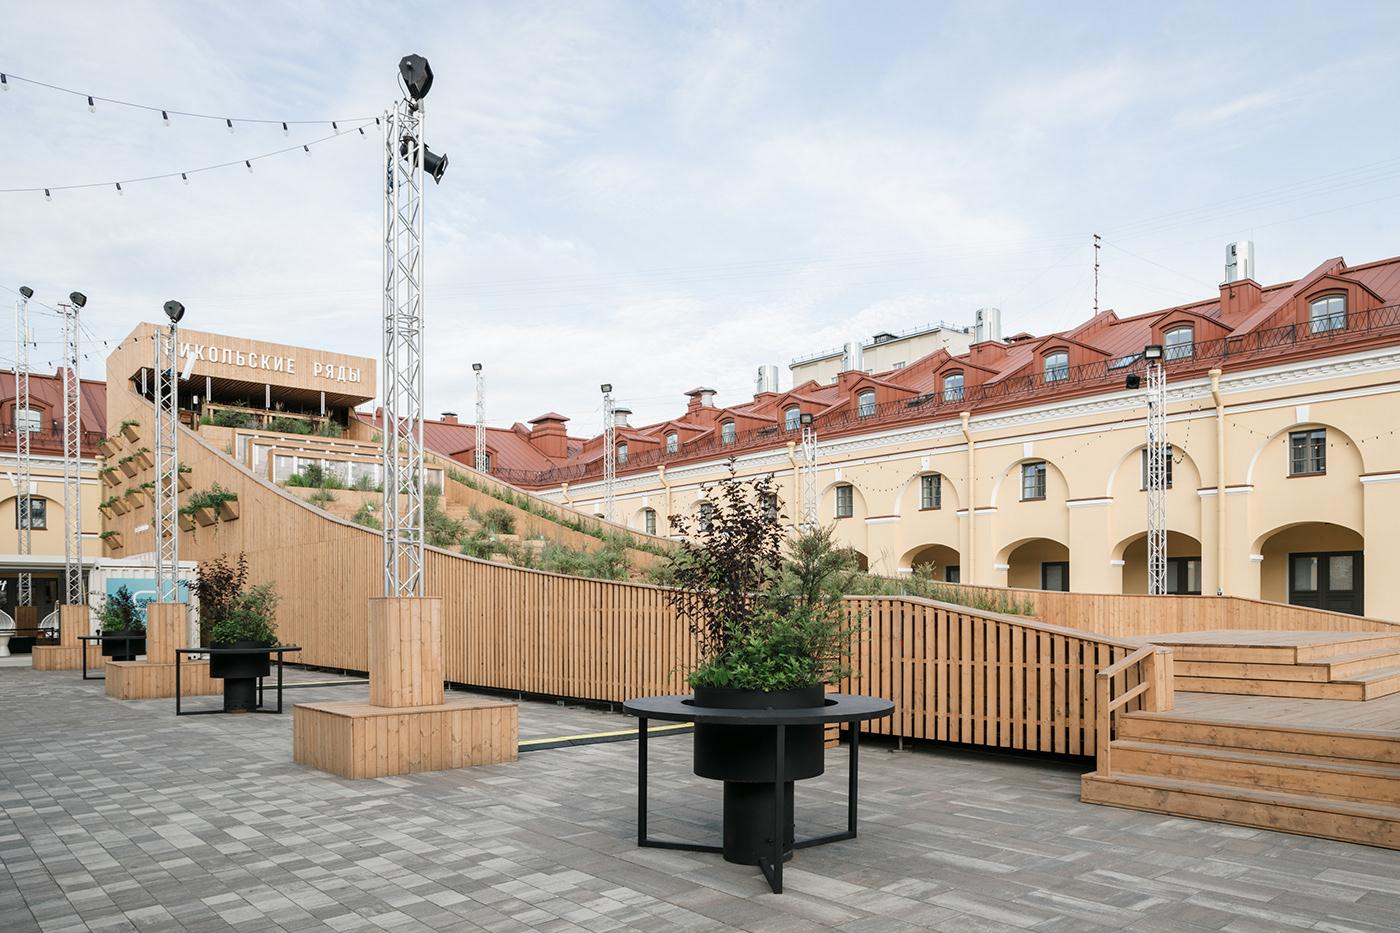 architecture contemporary architecture installation Katarsis katarsis ab katarsis architects public spaces russian architecture Saint-Petersburg structures